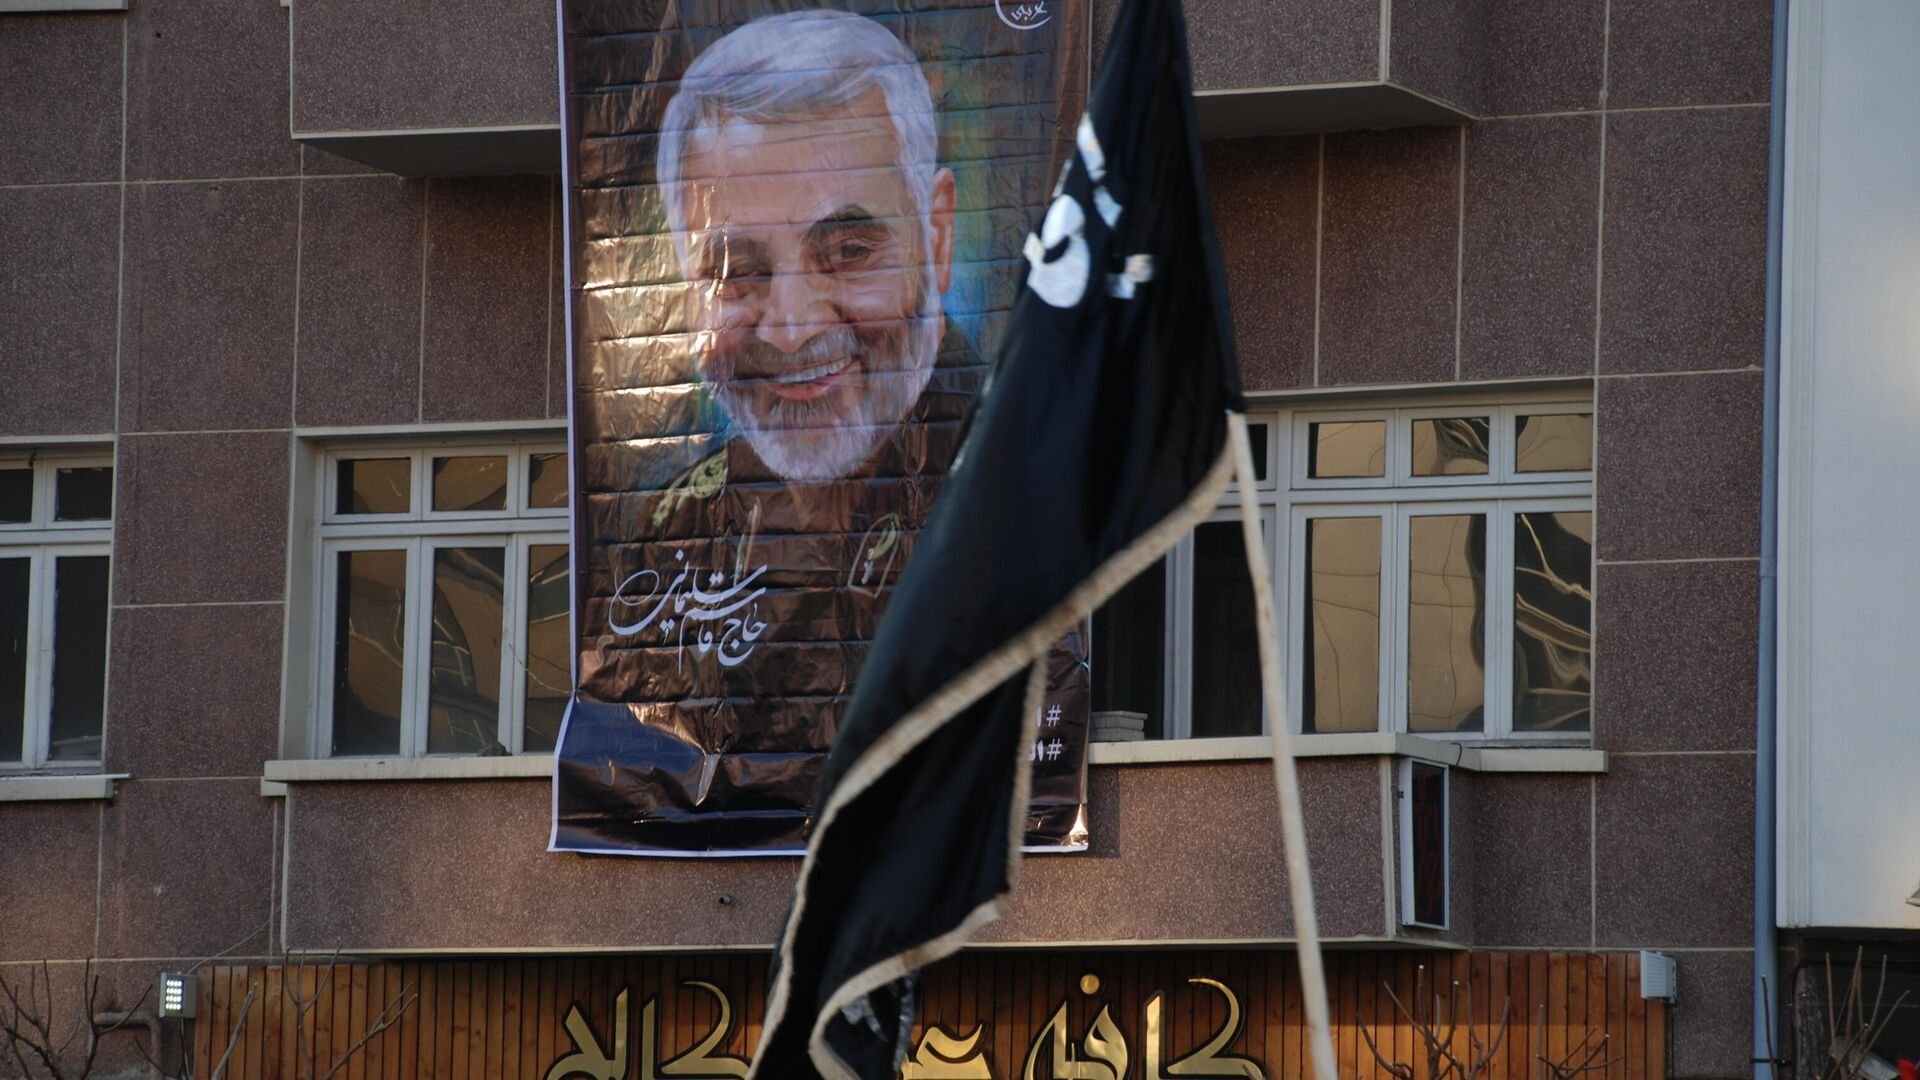 Прощание с Касемом Сулеймани в Тегеране. 6 января 2020 - РИА Новости, 1920, 26.04.2021